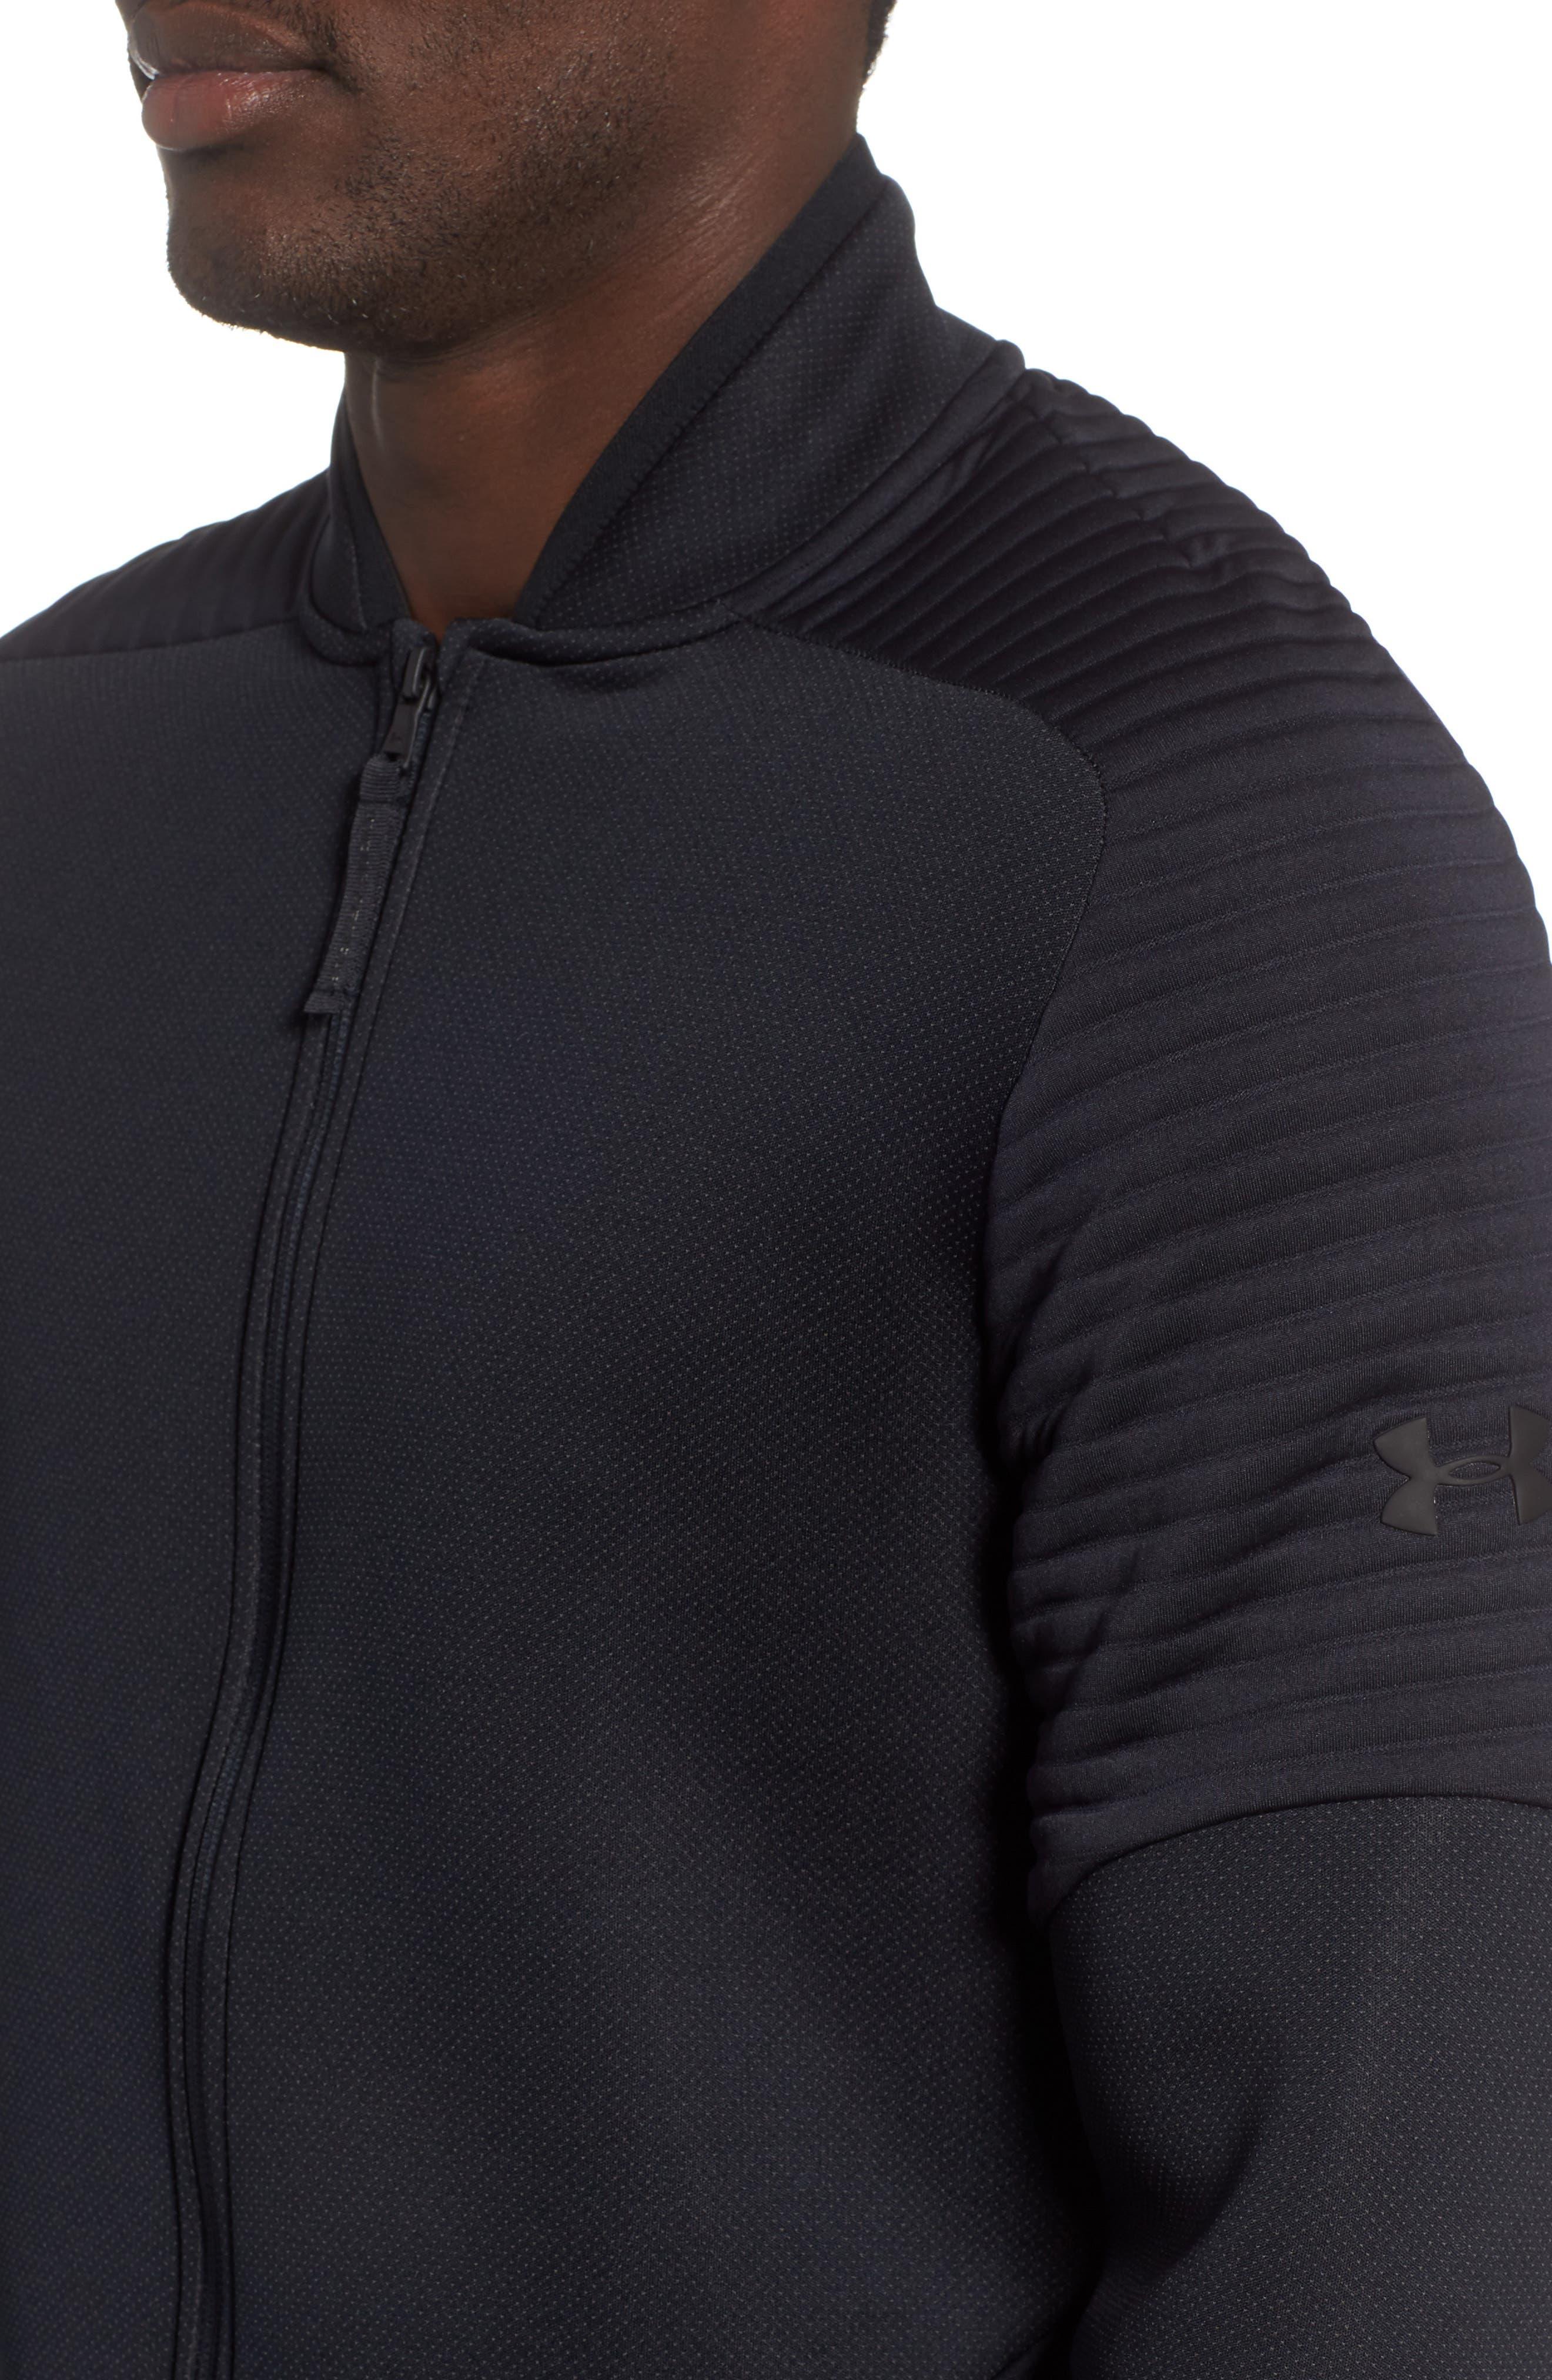 Unstoppable /MOVE Jacket,                             Alternate thumbnail 4, color,                             BLACK/ CHARCOAL/ BLACK